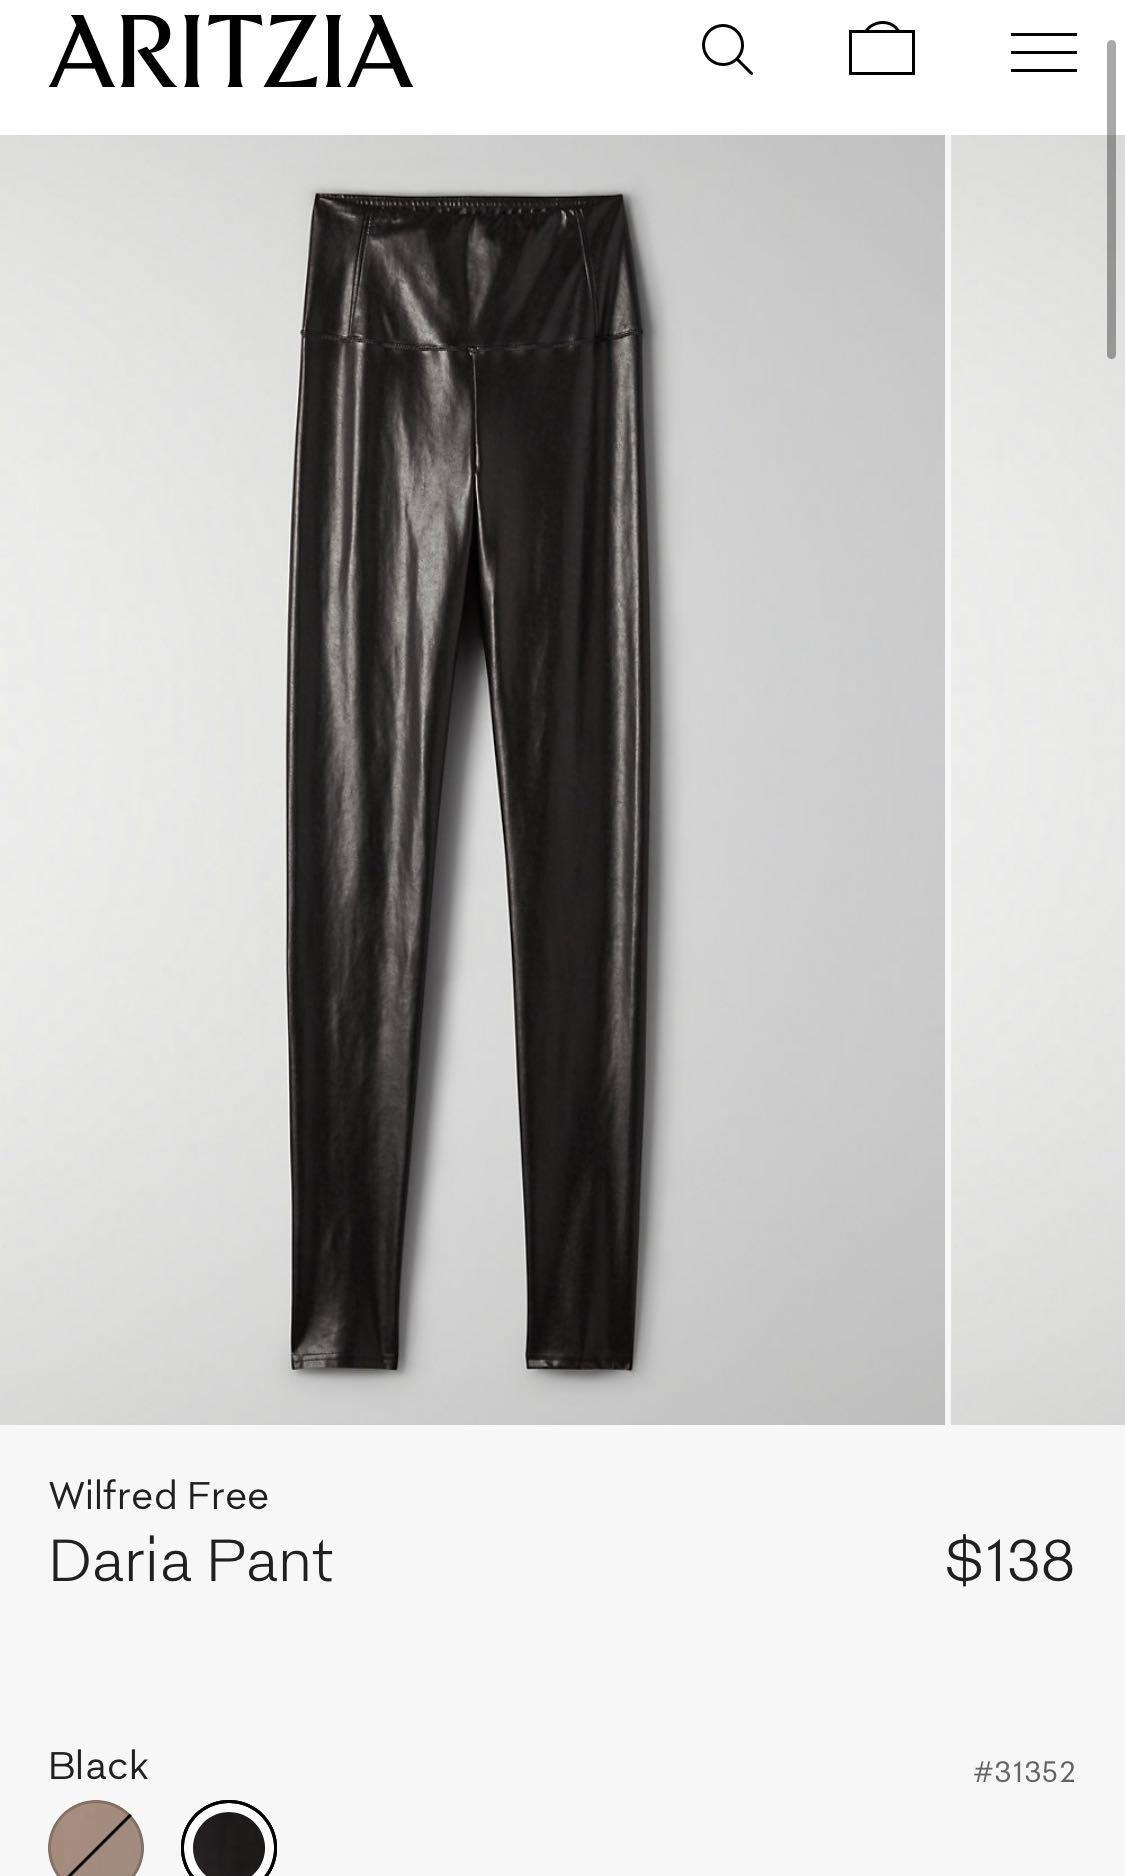 Wilfred Free Daria leather legging Aritzia - black - size small